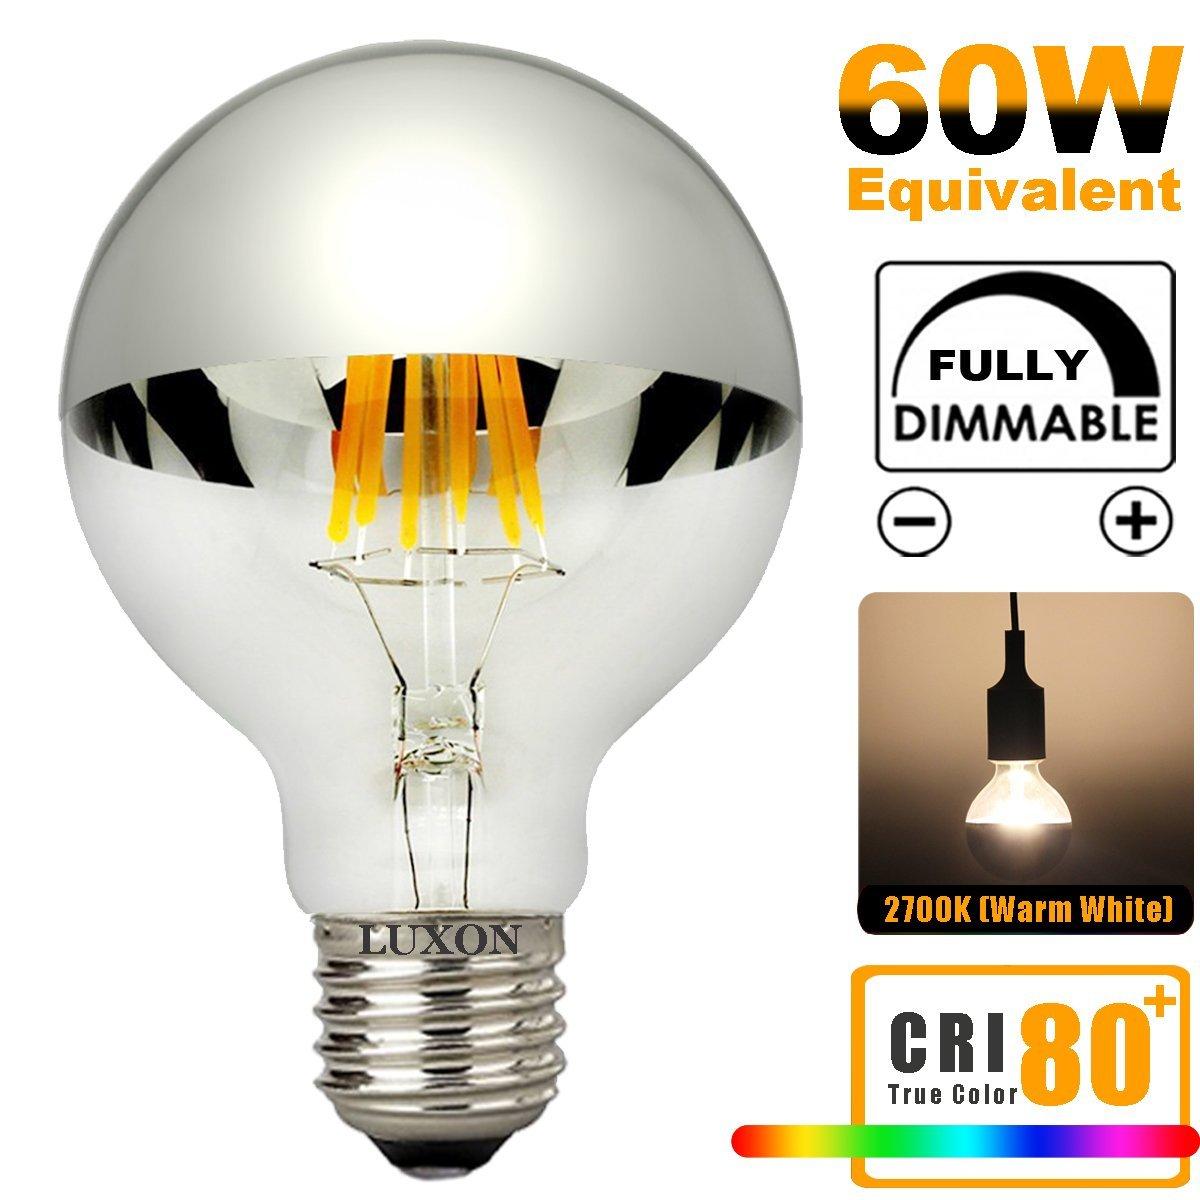 Half Chrome Light Bulb Dimmable LED 6W (60W Equivalent) G80/G25 E26 Warm White 2700K - $6 (S&S), $6.70 (Prime)